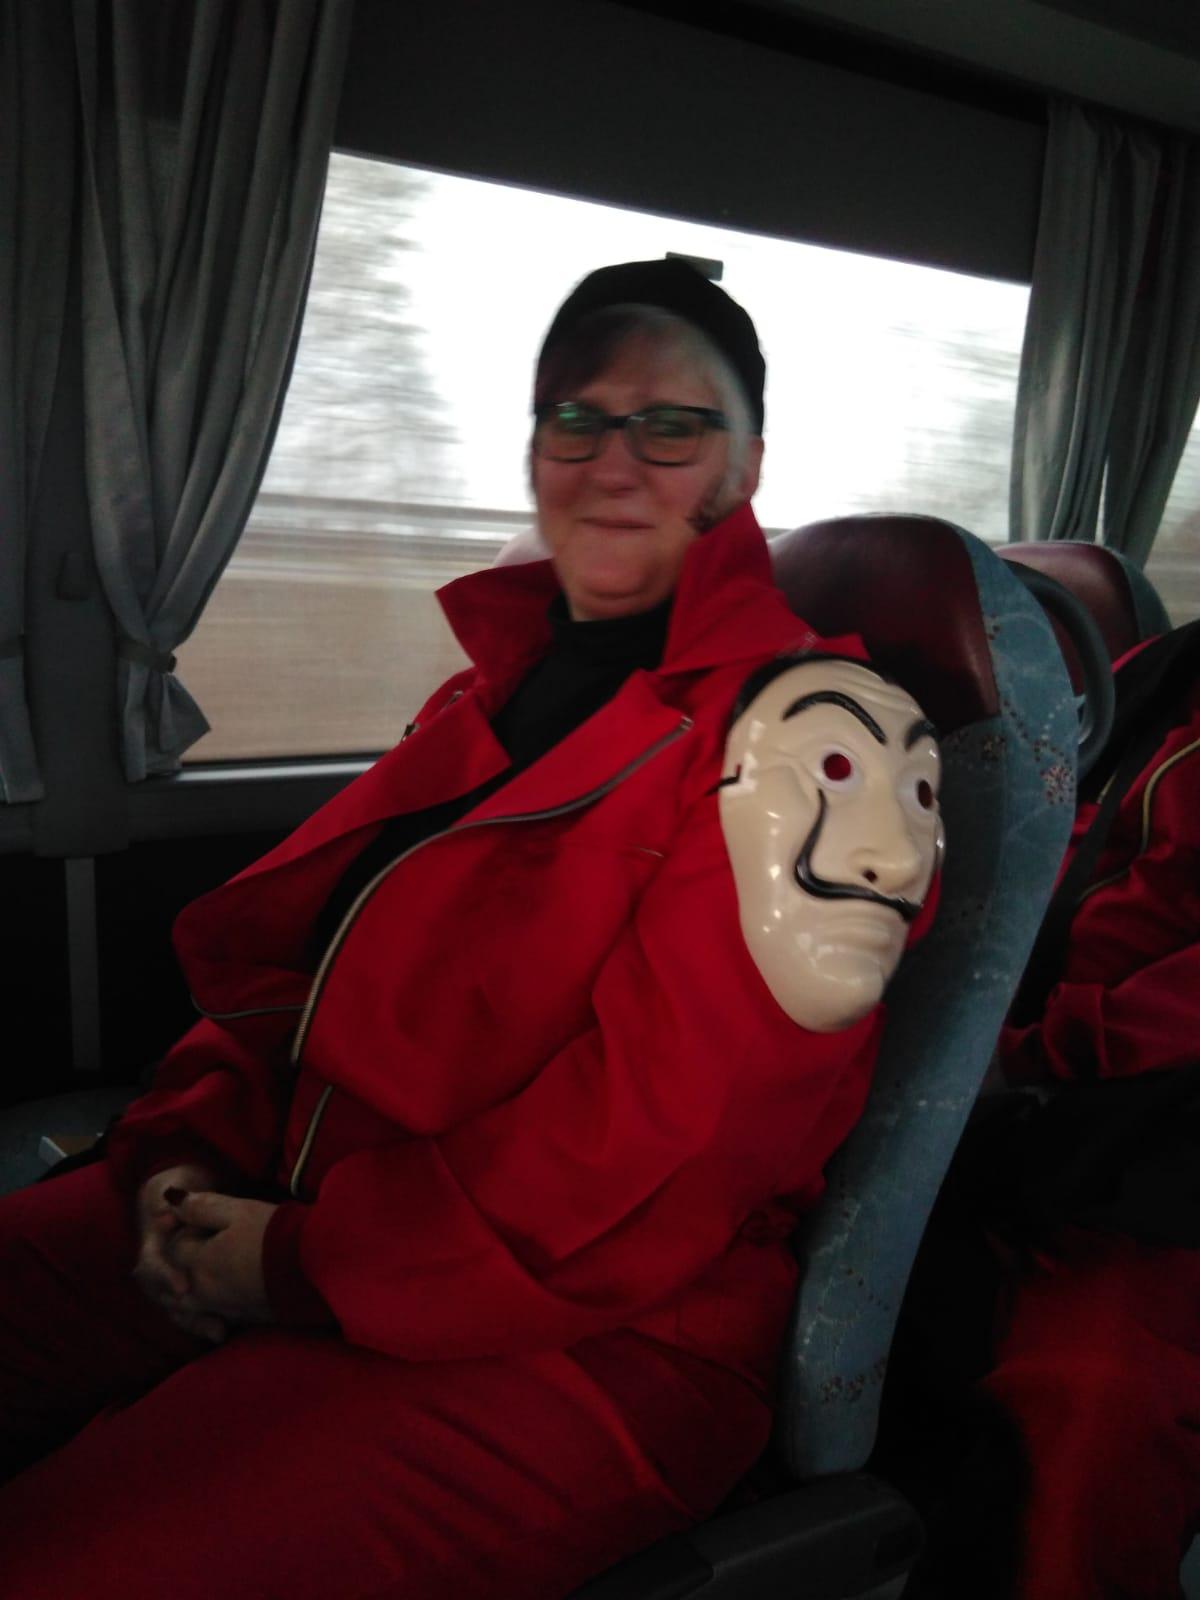 NoName-Guggen-Andernach-2020-Karneval-17